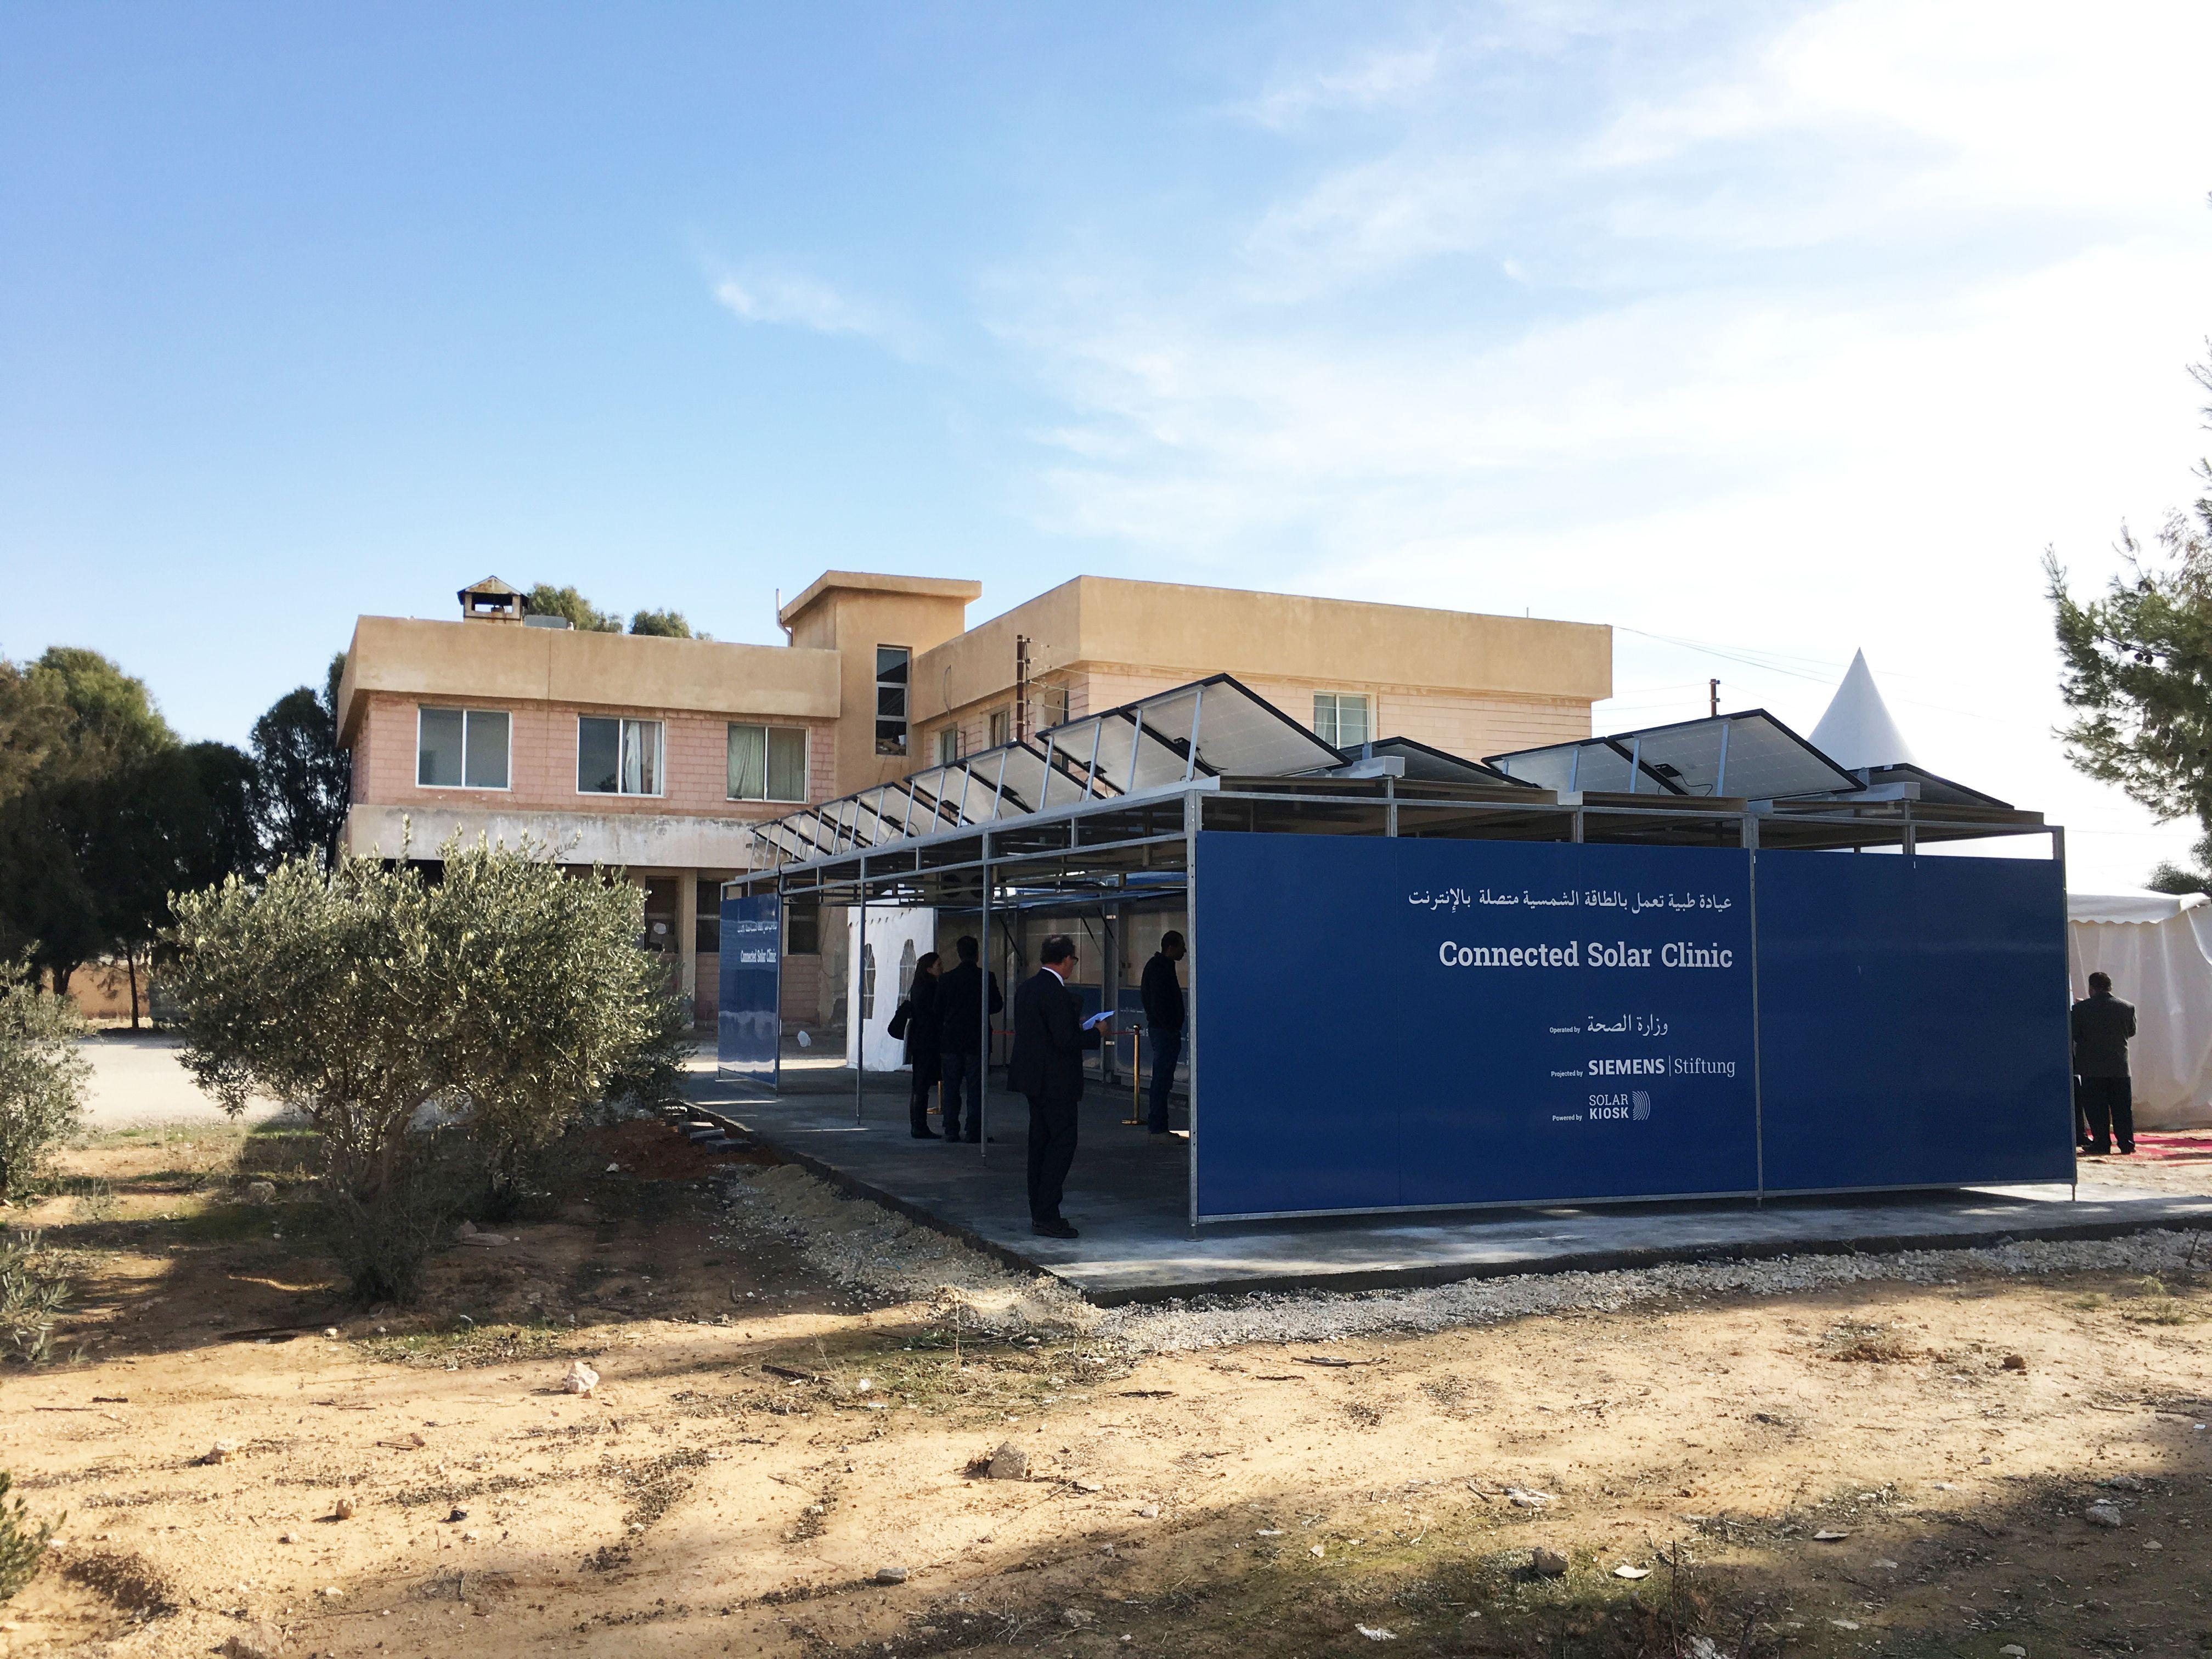 GRAFT Solar Clinic